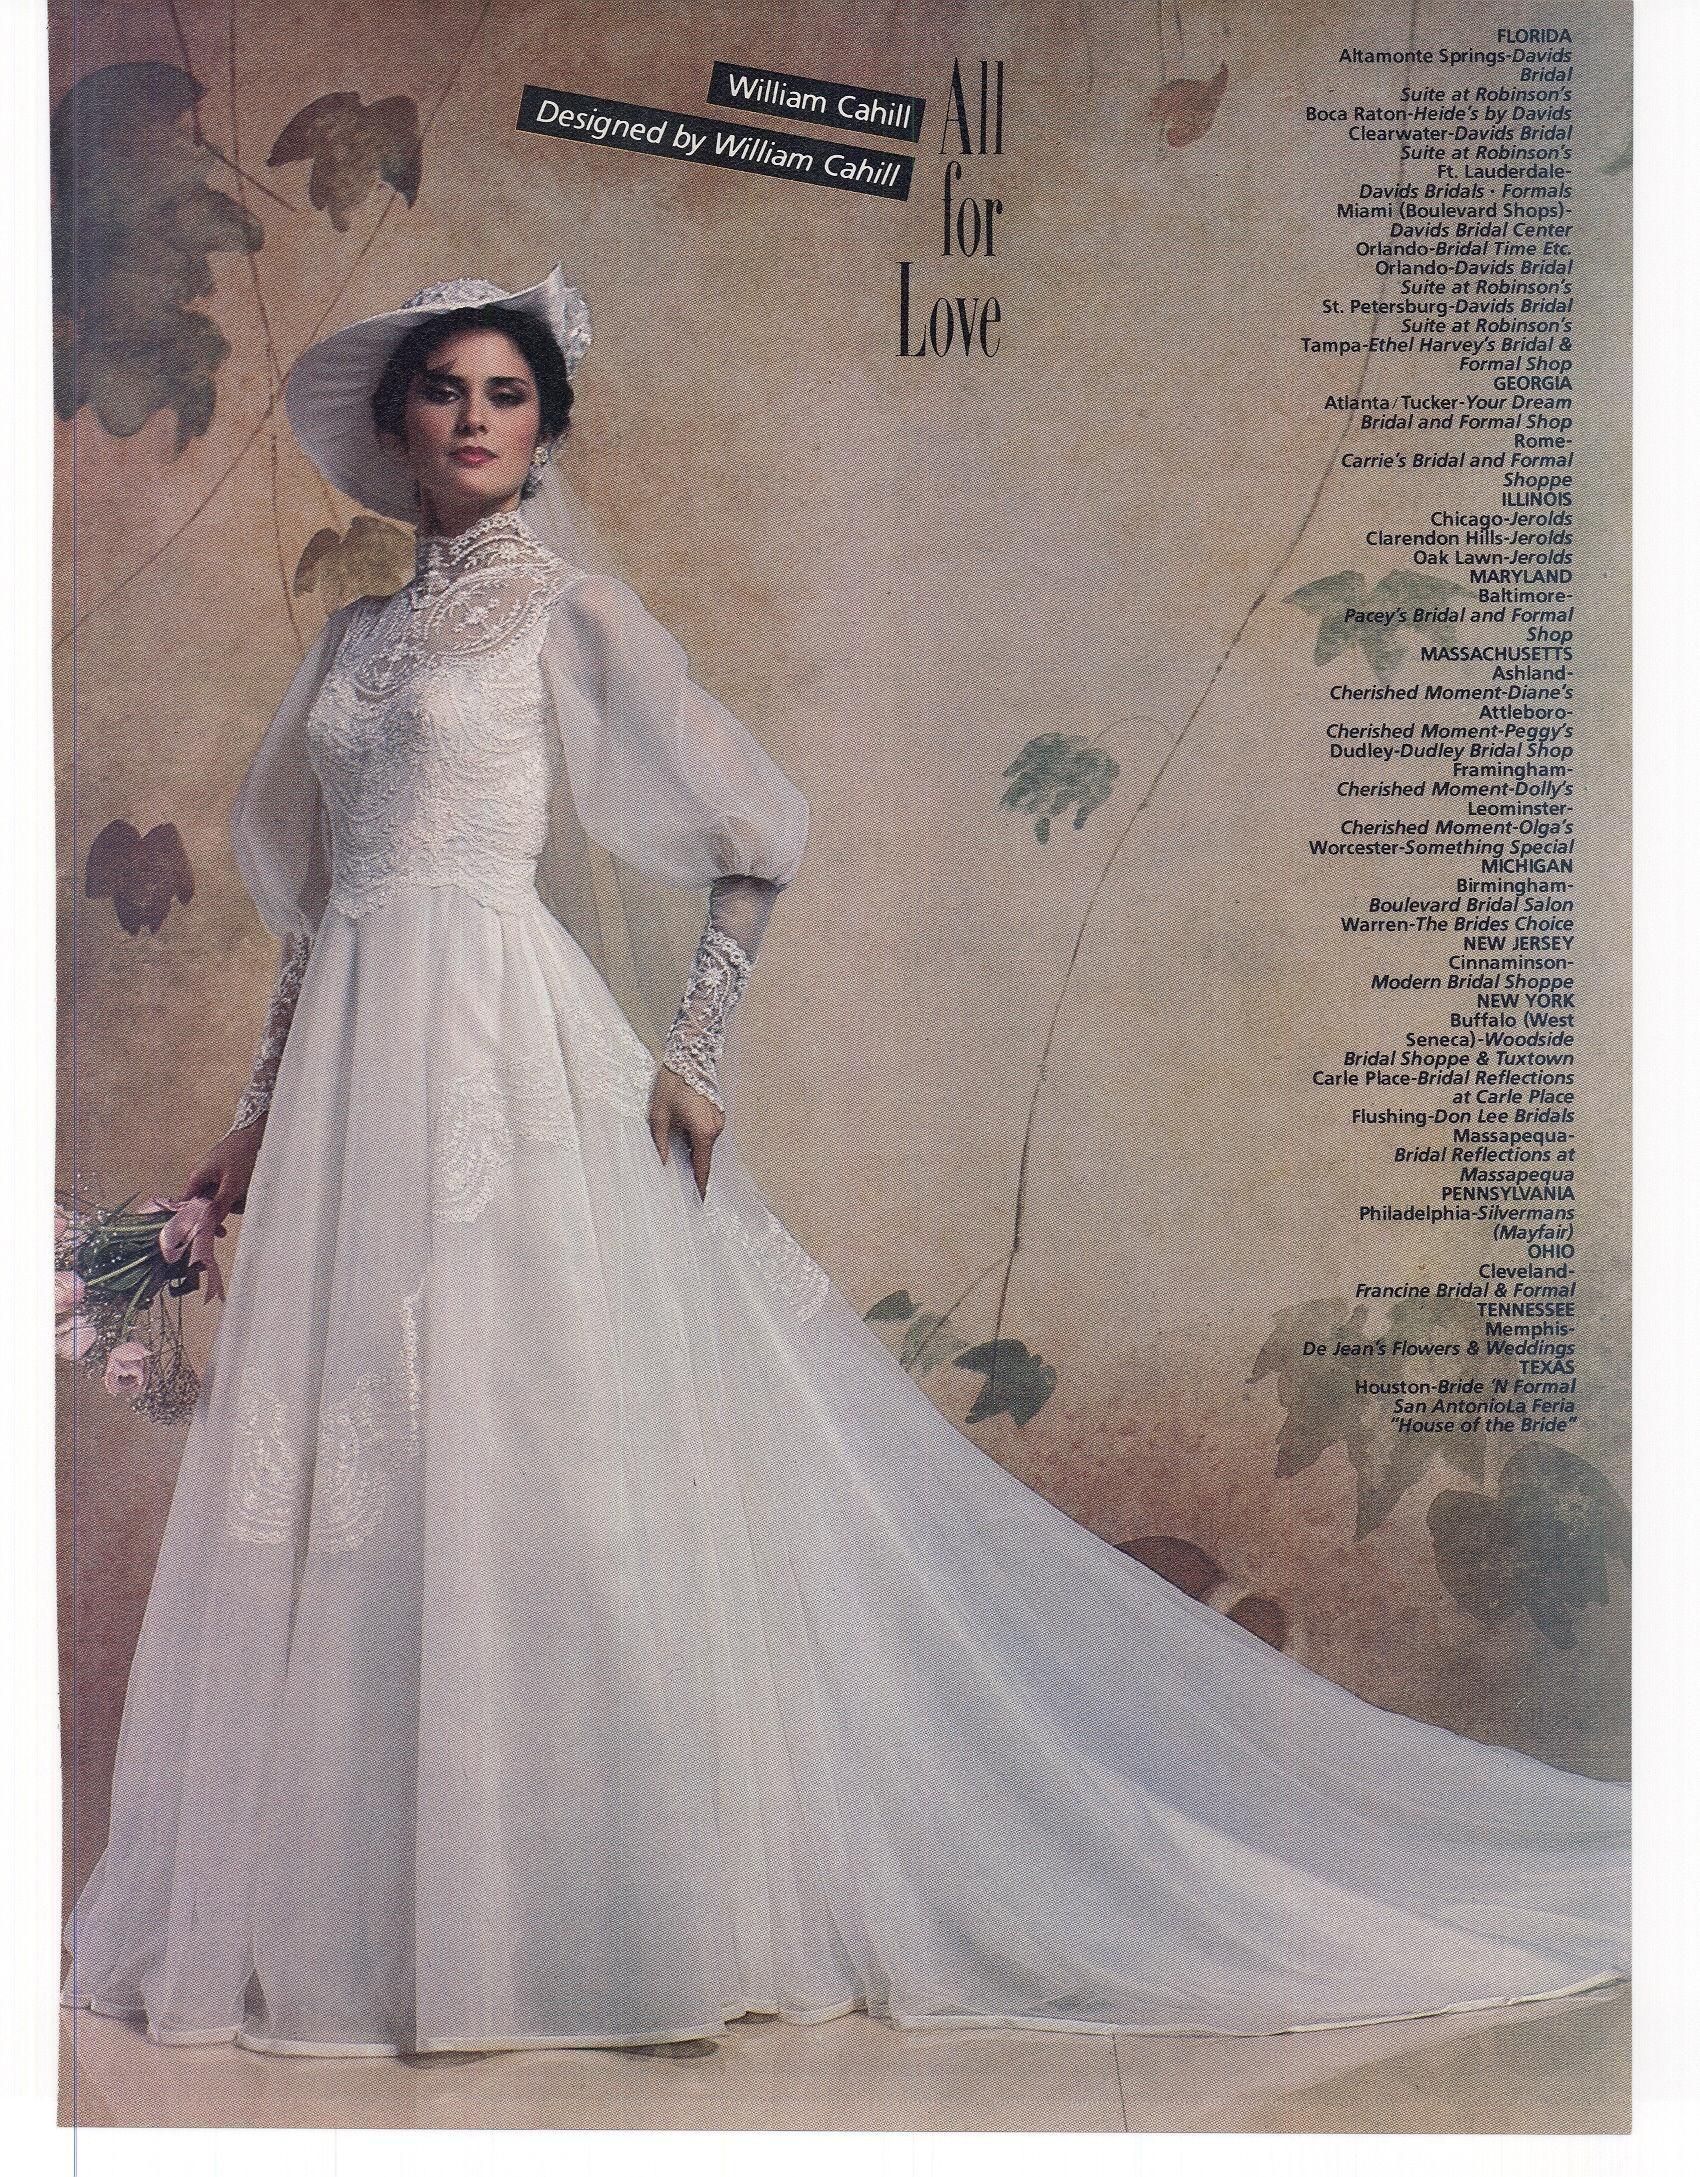 Pin von Lisa Jordan auf Vintage Weddings | Pinterest